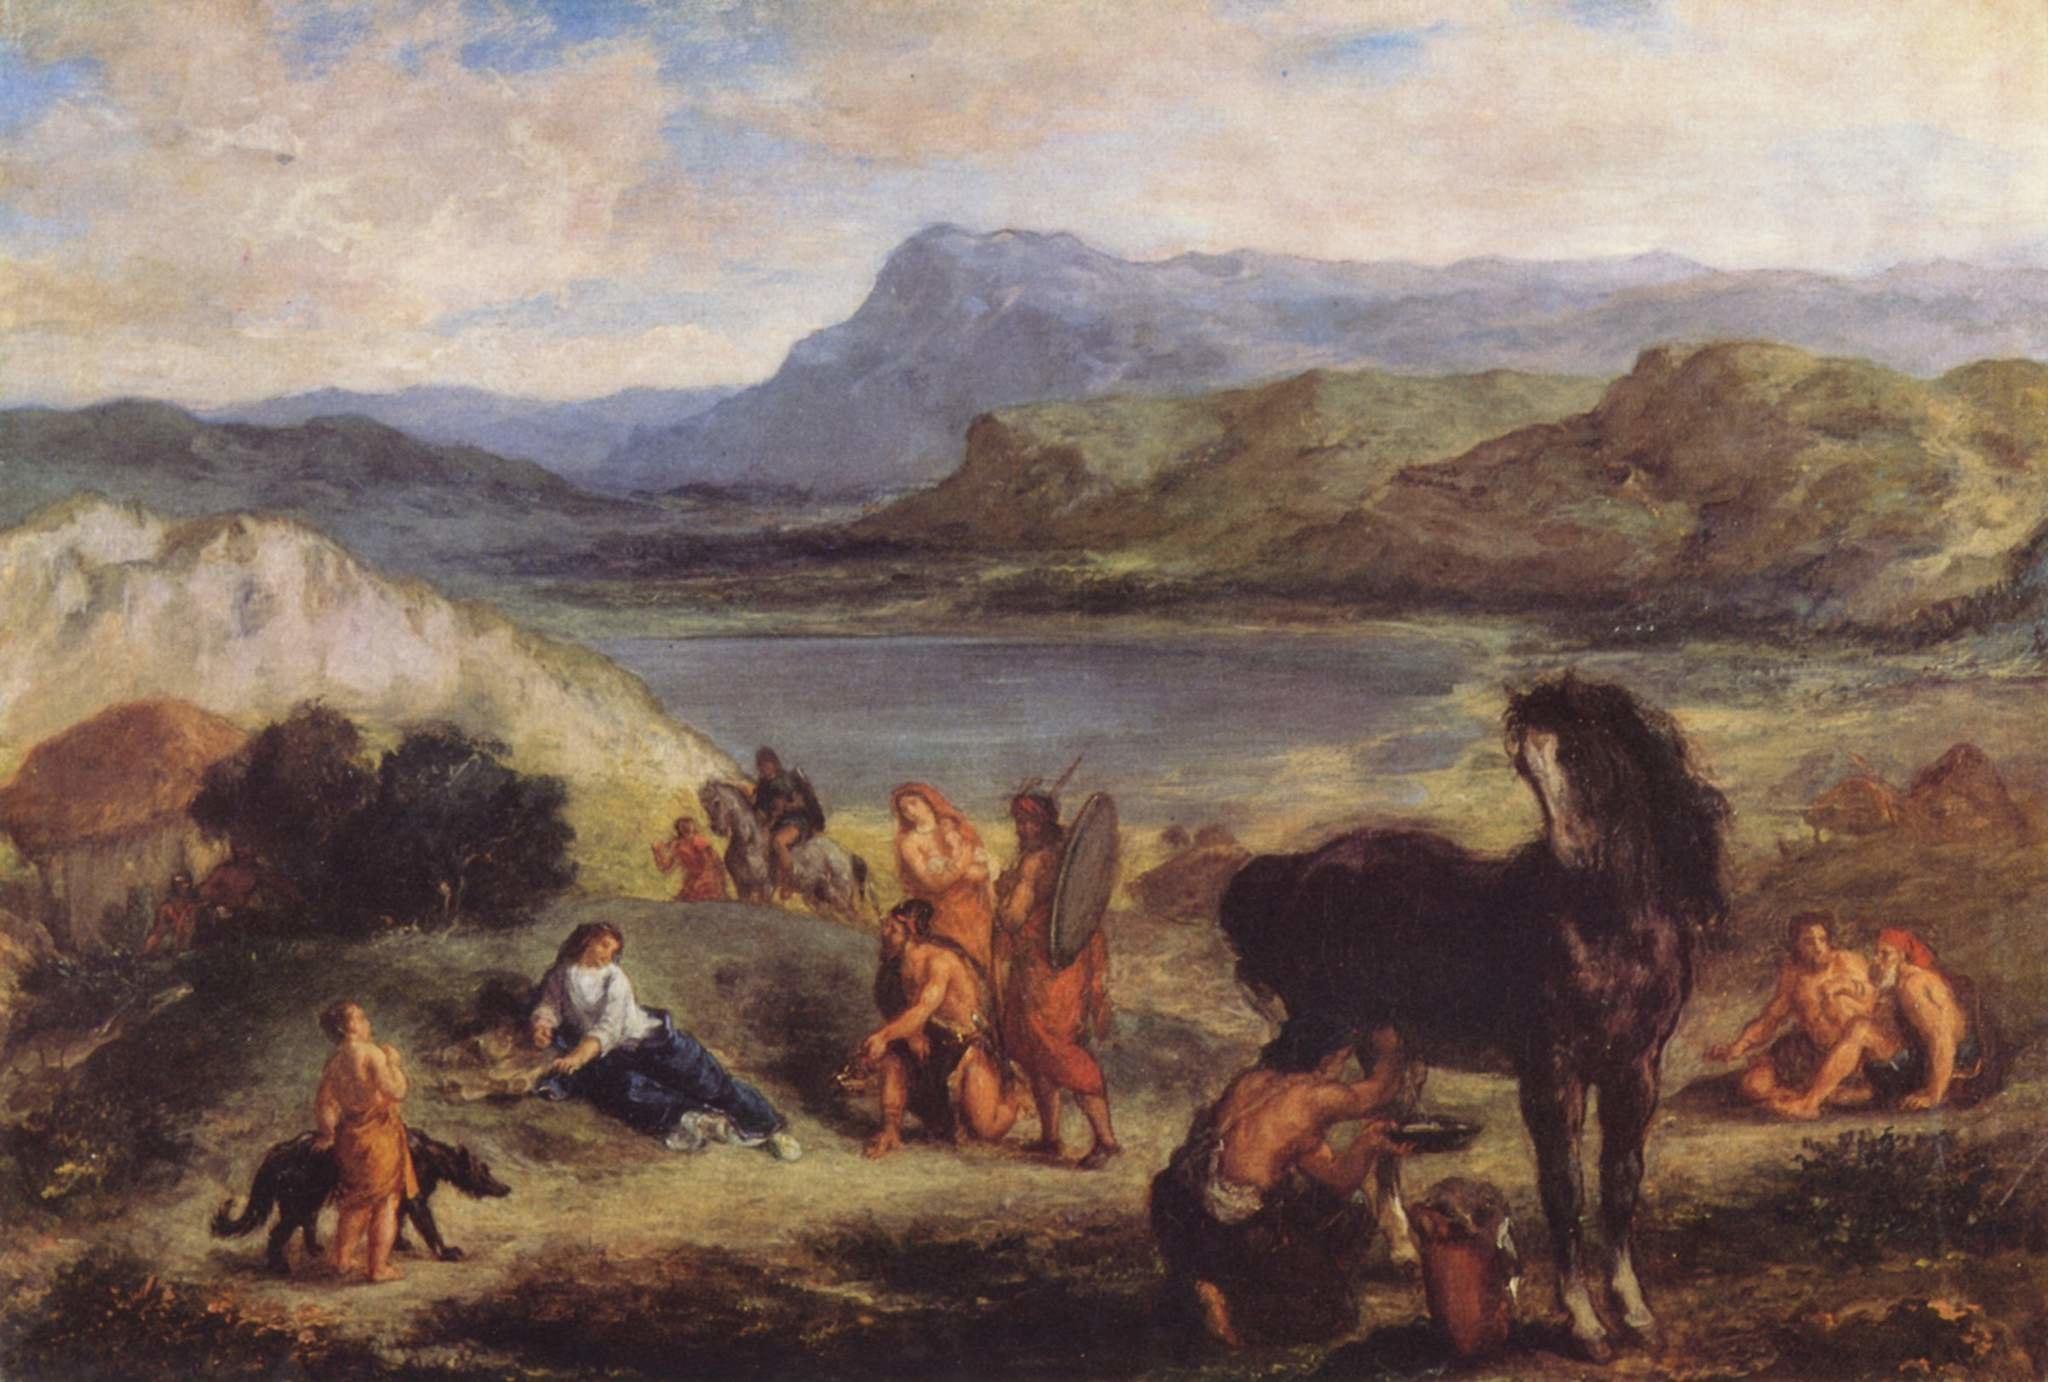 Ovide chez les Scythes (Delacroix) National Gallery